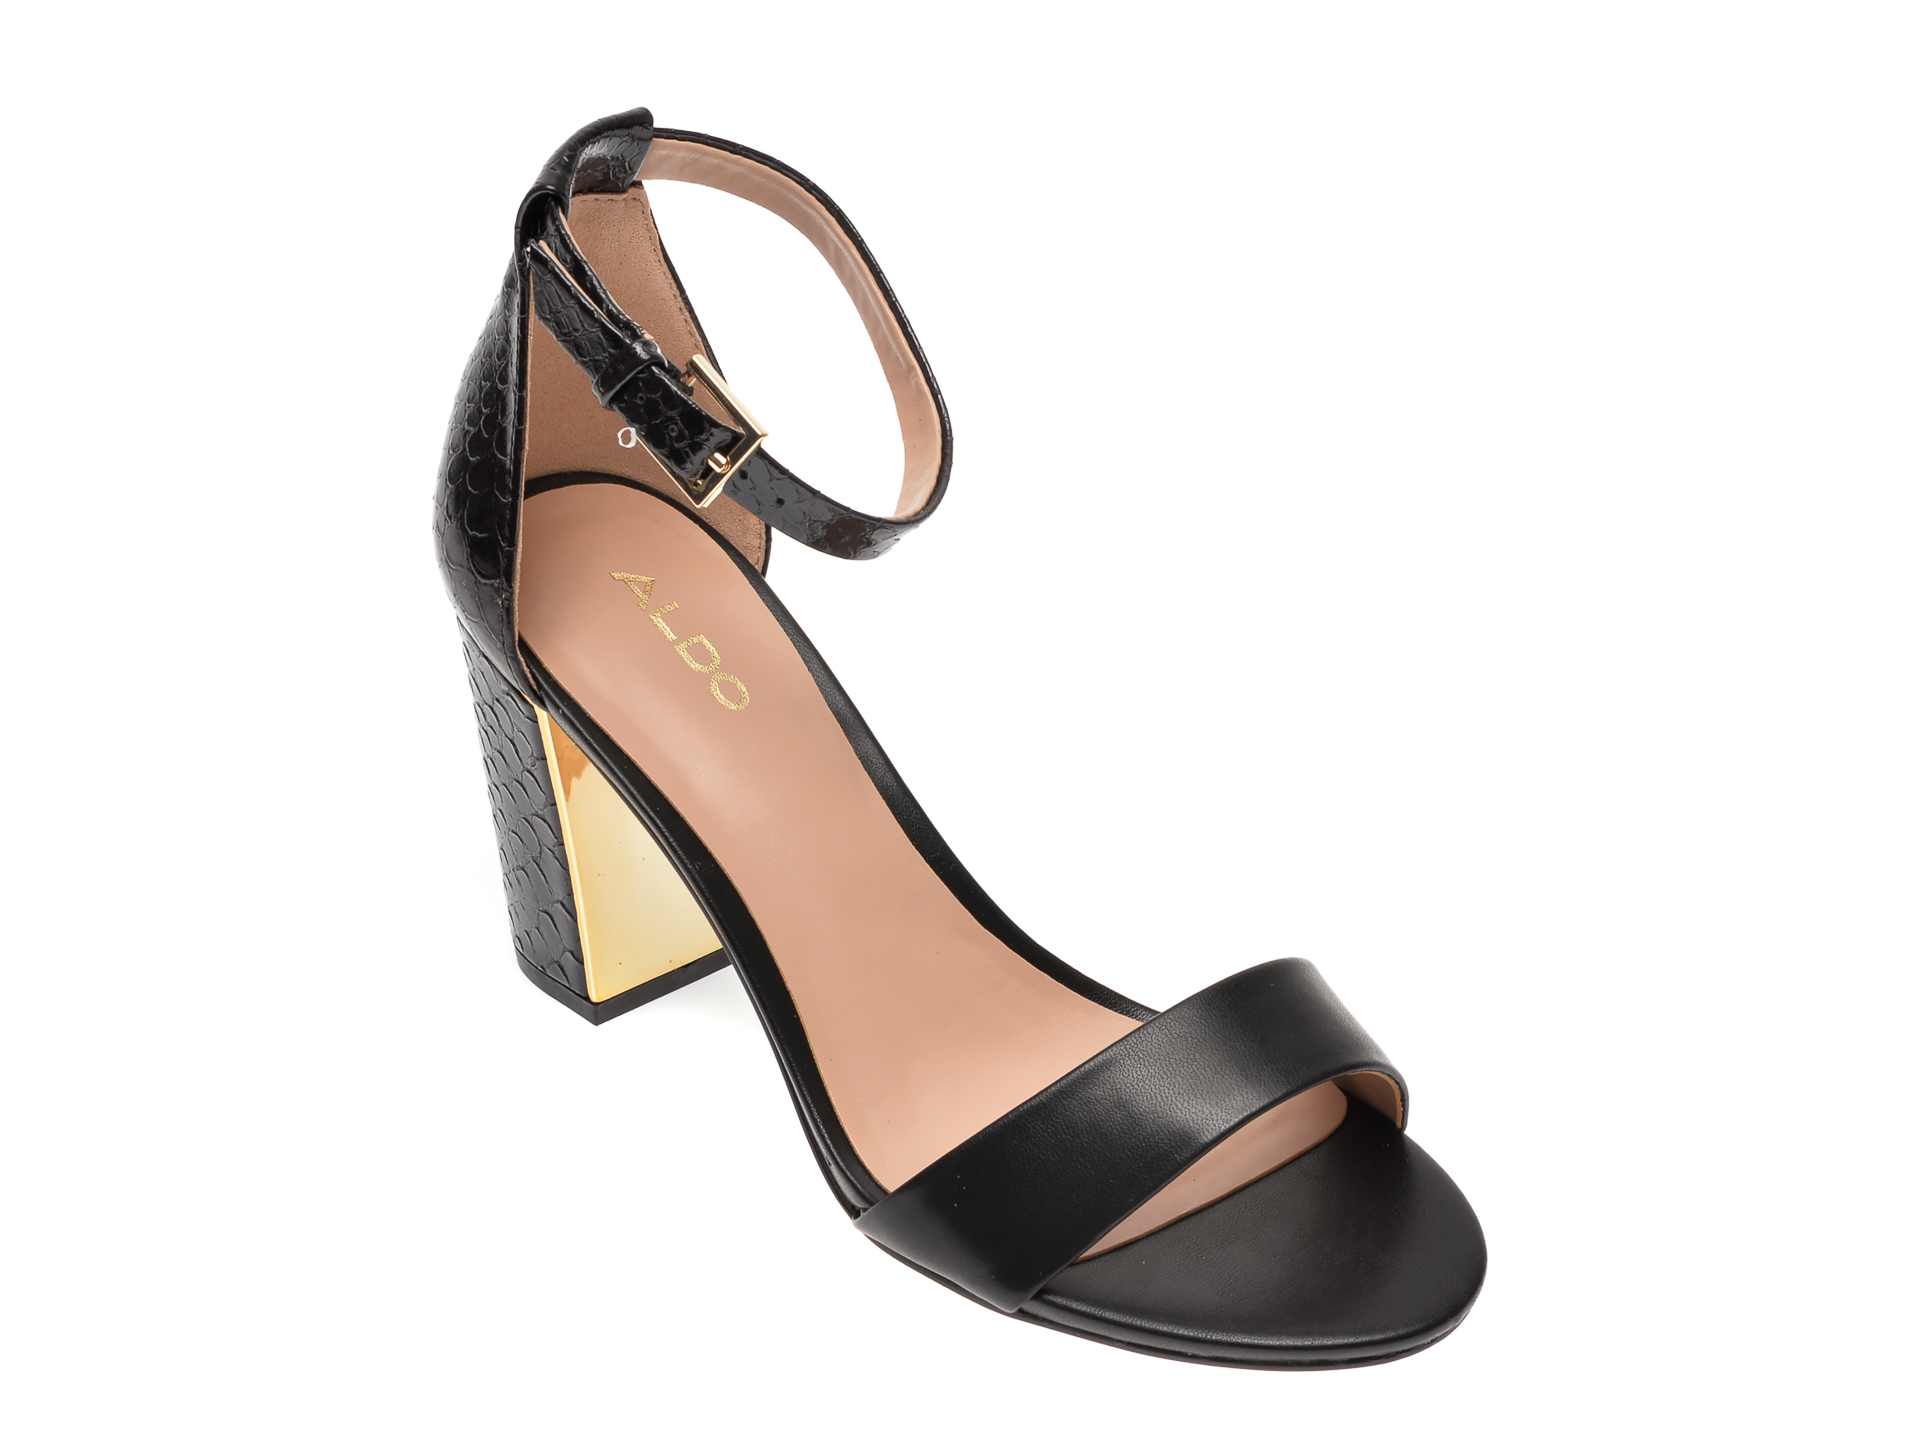 Sandale ALDO negre, Gradifolia001, din piele ecologica imagine otter.ro 2021